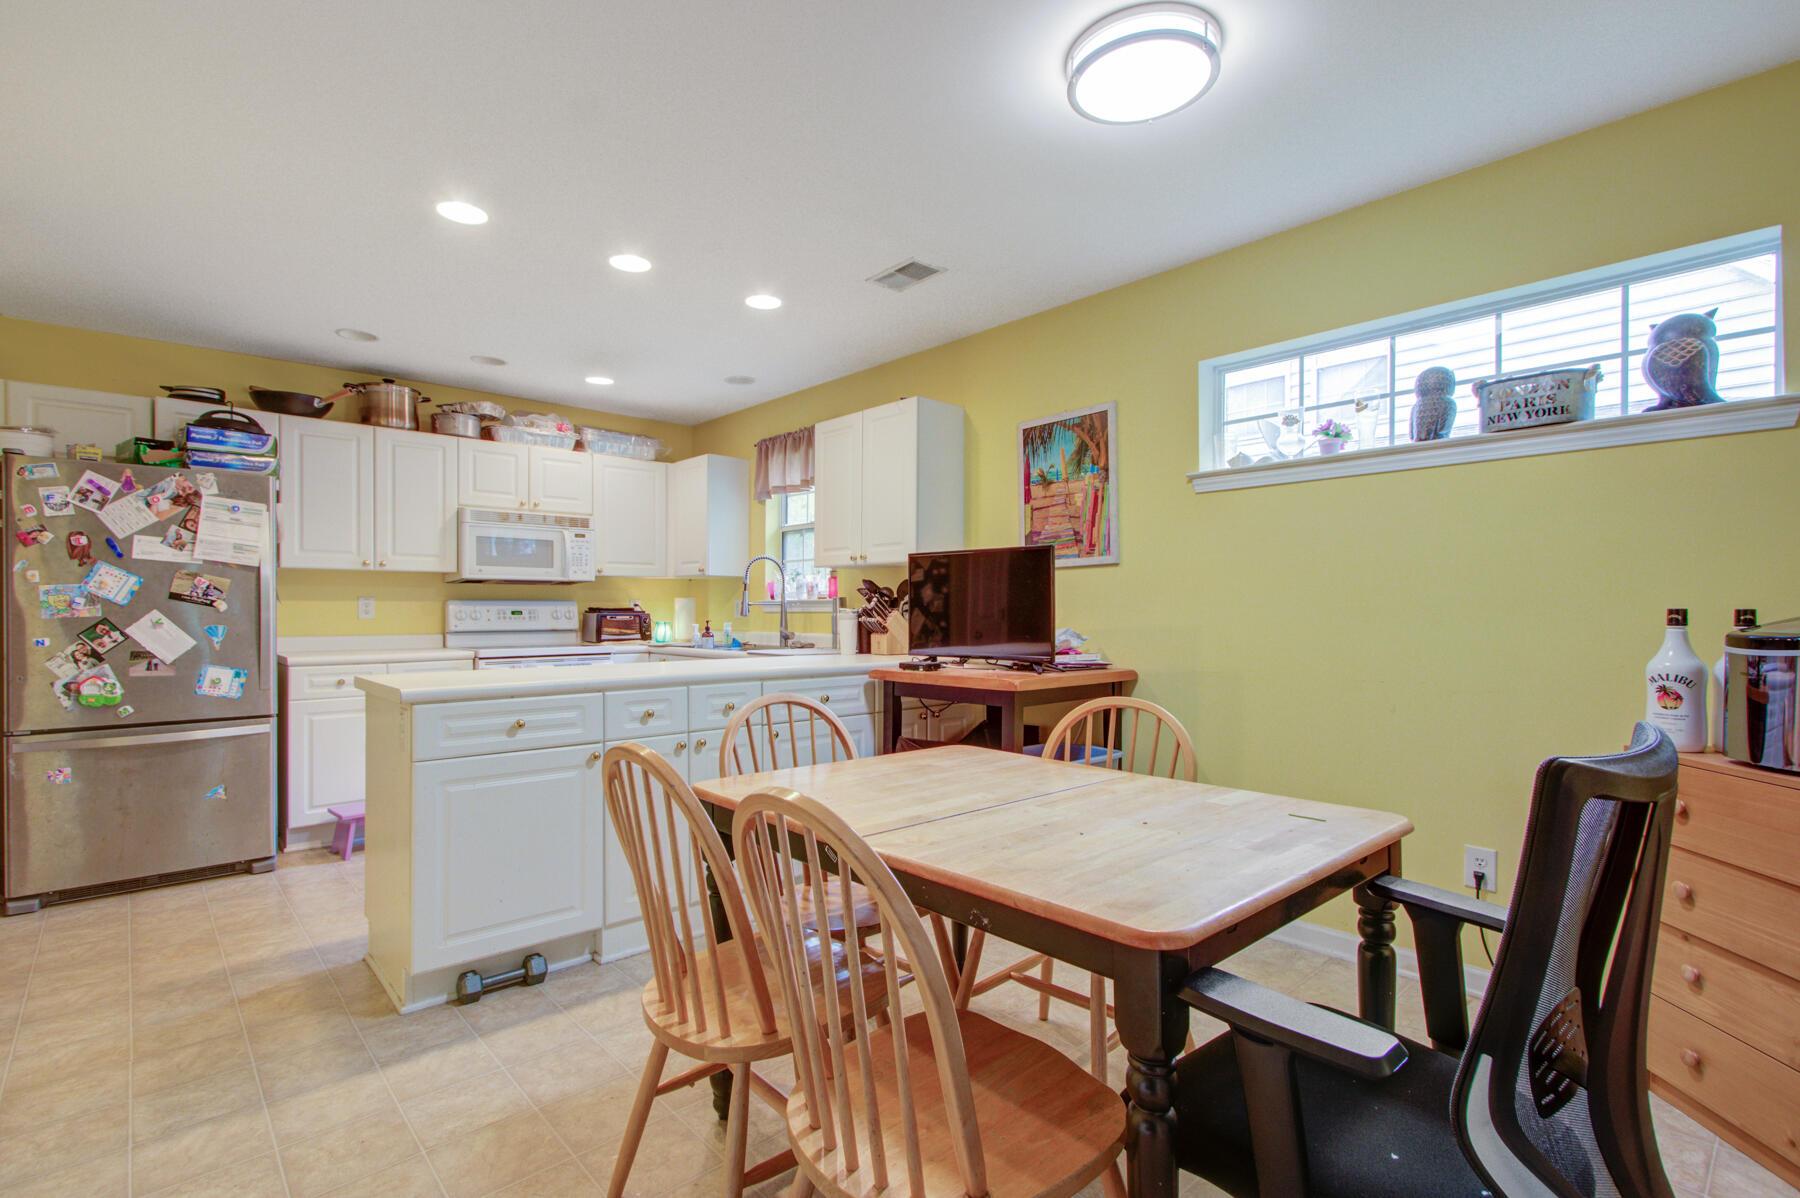 Dunes West Homes For Sale - 2232 Kings Gate, Mount Pleasant, SC - 7